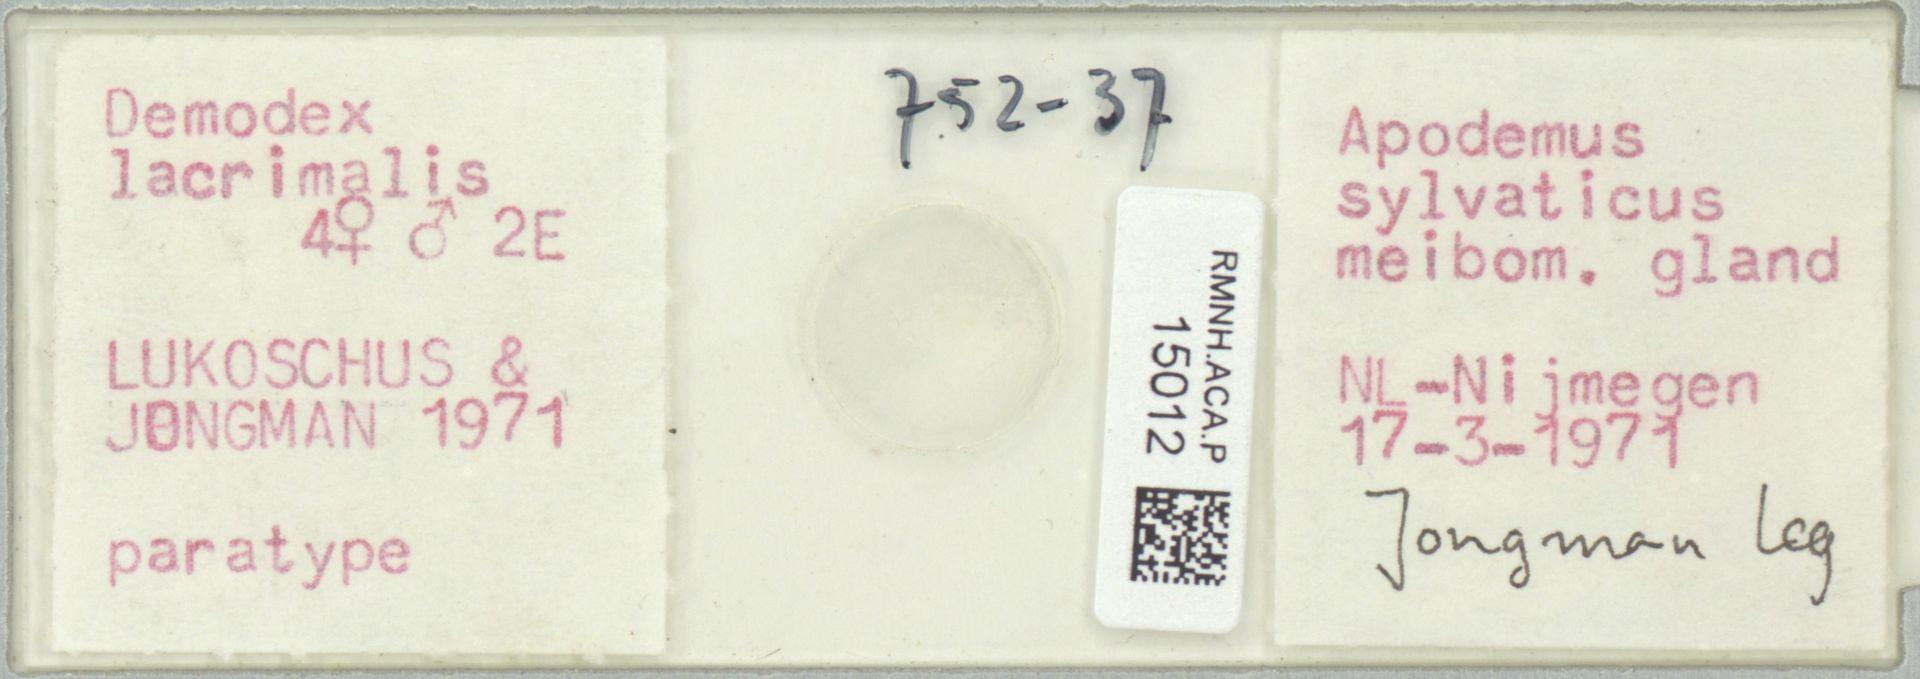 RMNH.ACA.P.15012 | Demodex lacrimalis Lukoschus & Jongman, 1971